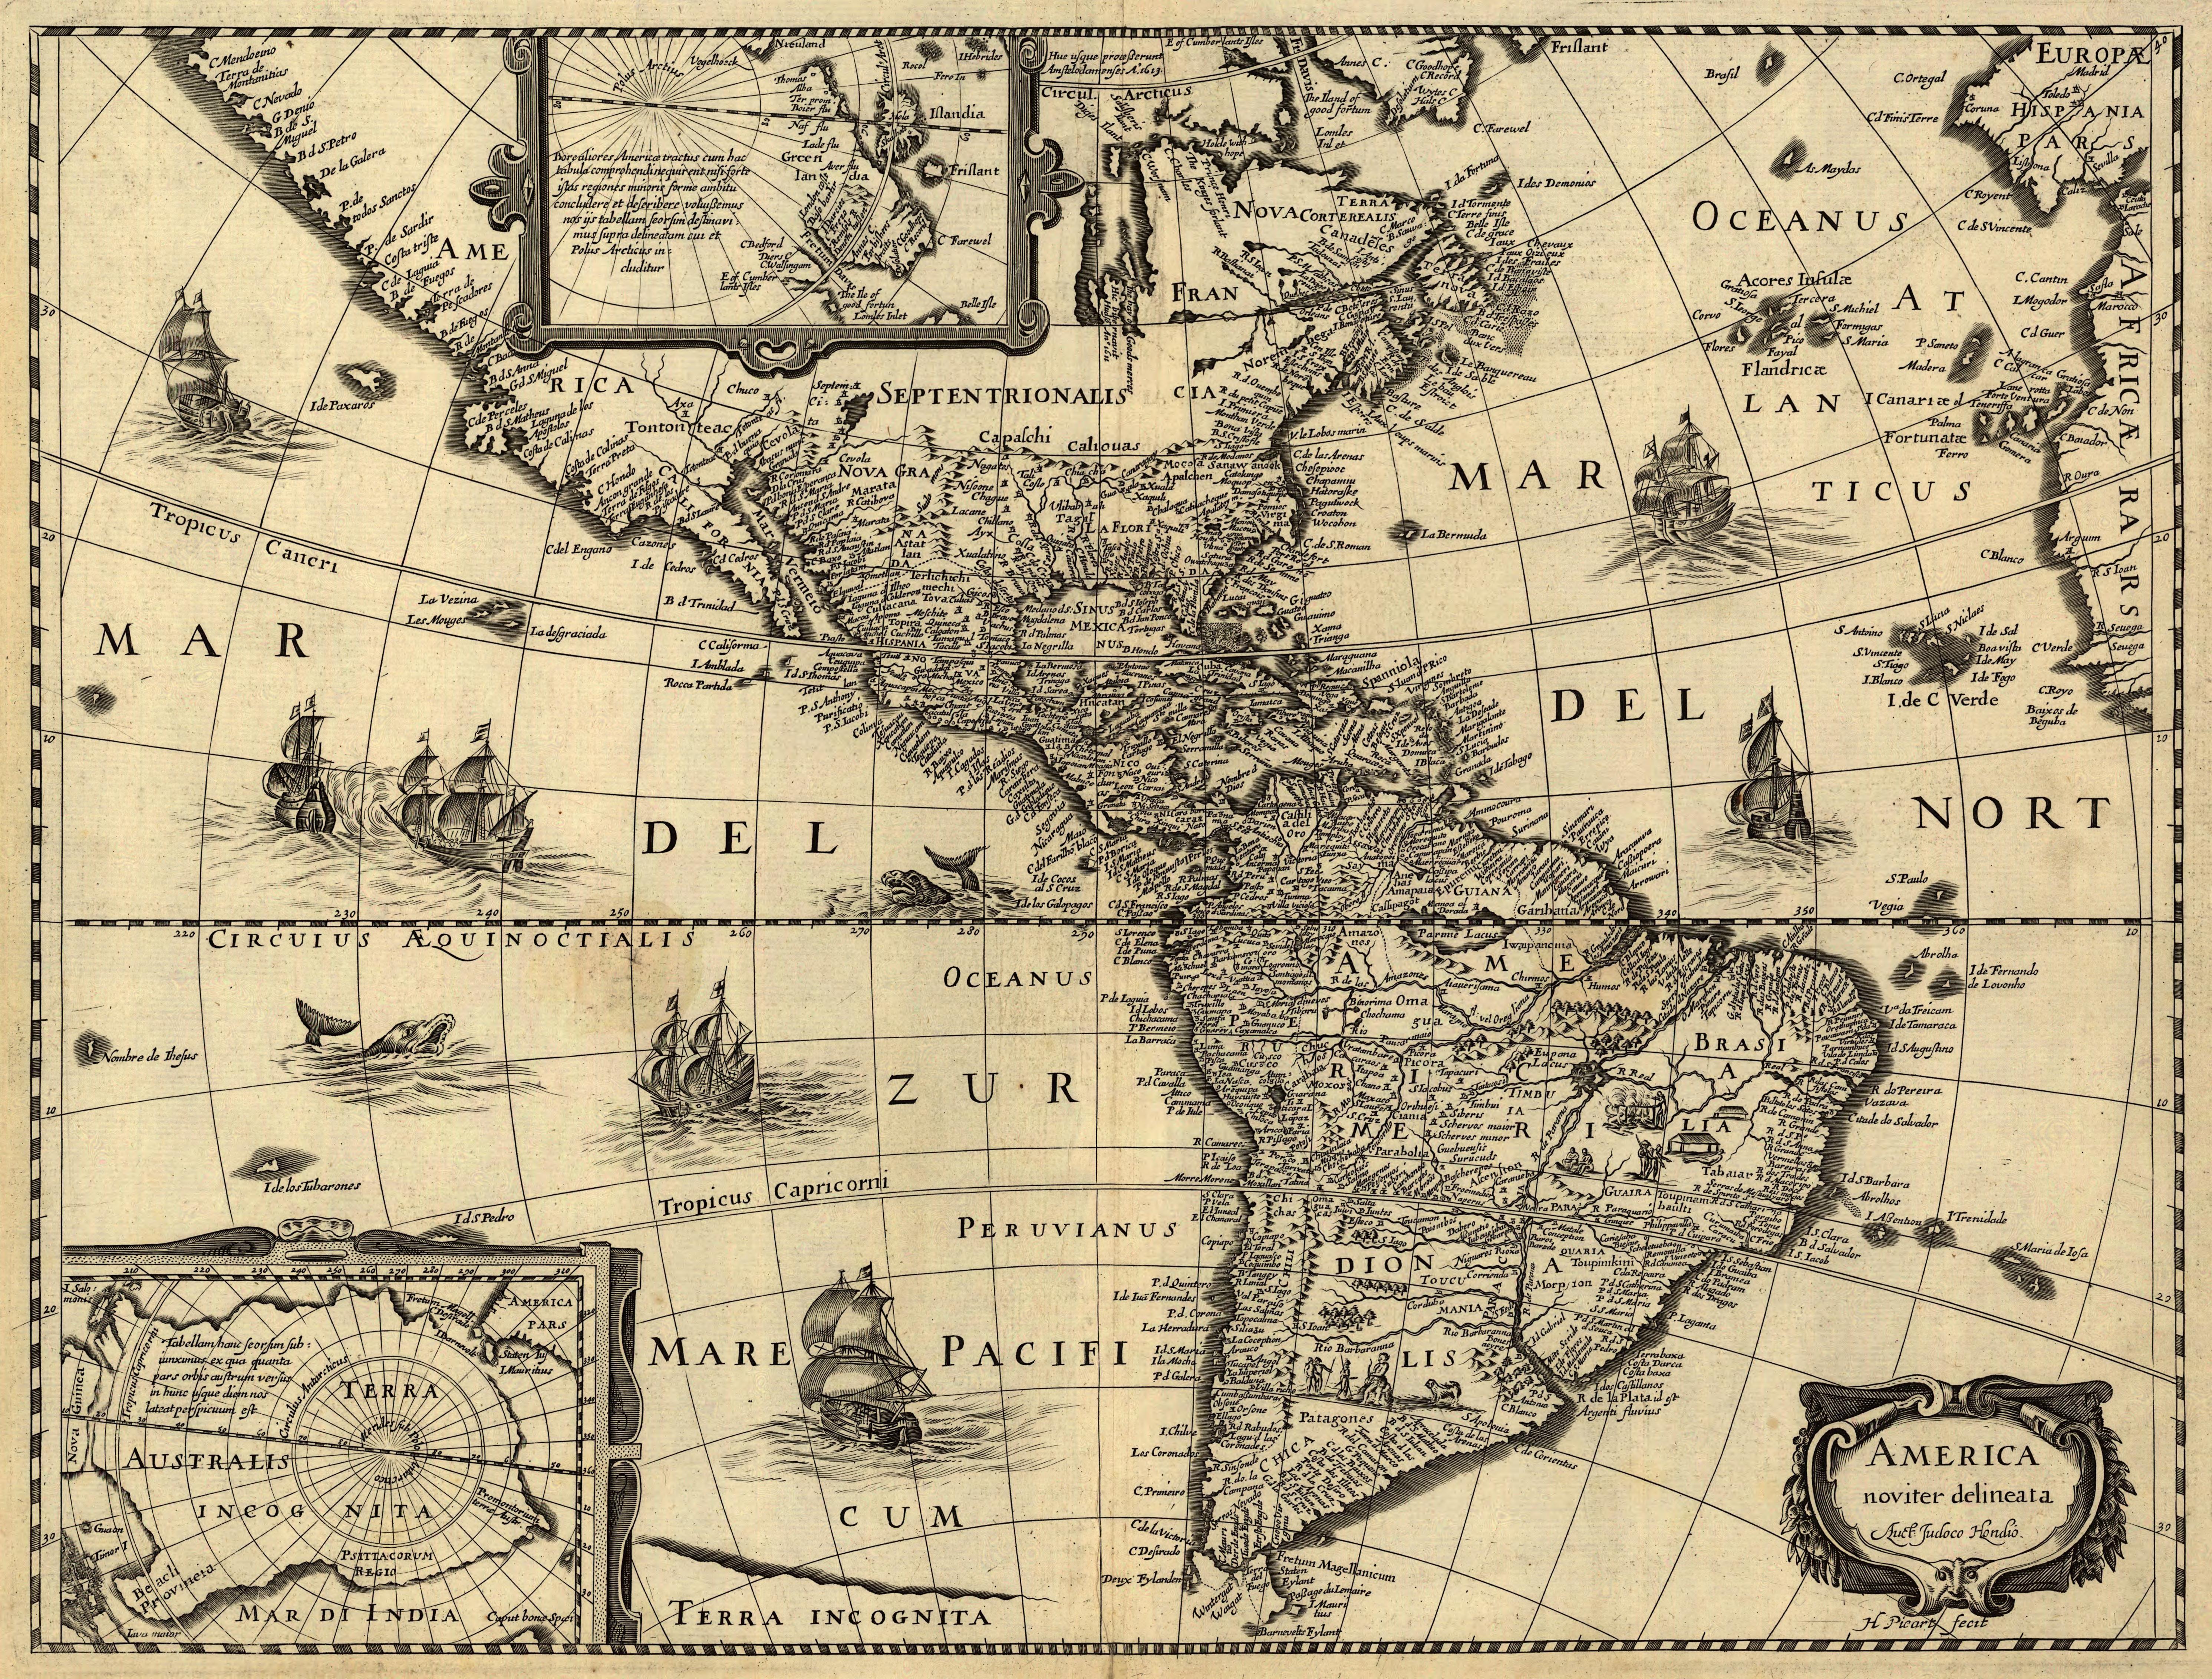 Americanoviterdelineatag 59654528 maps pinterest americanoviterdelineatag 59654528 antique mapsvintage publicscrutiny Image collections